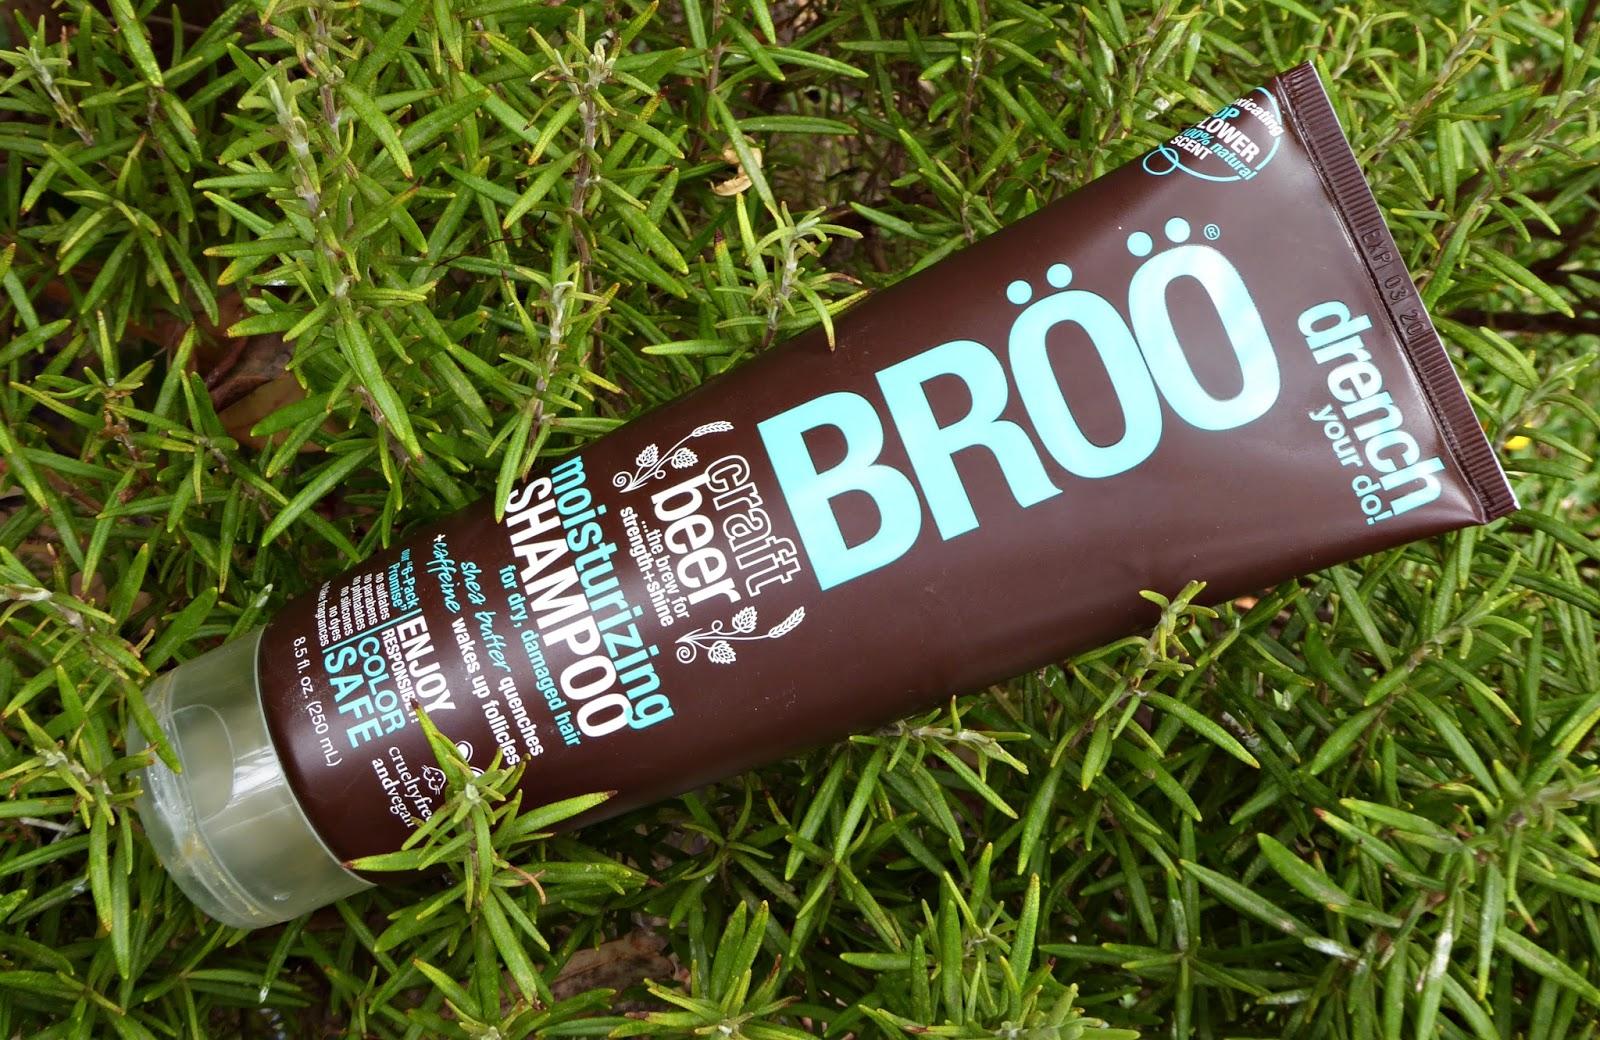 iHerb: Moisturizing Shampoo de Broo. Champú de cerveza y karité para cabello seco y dañado